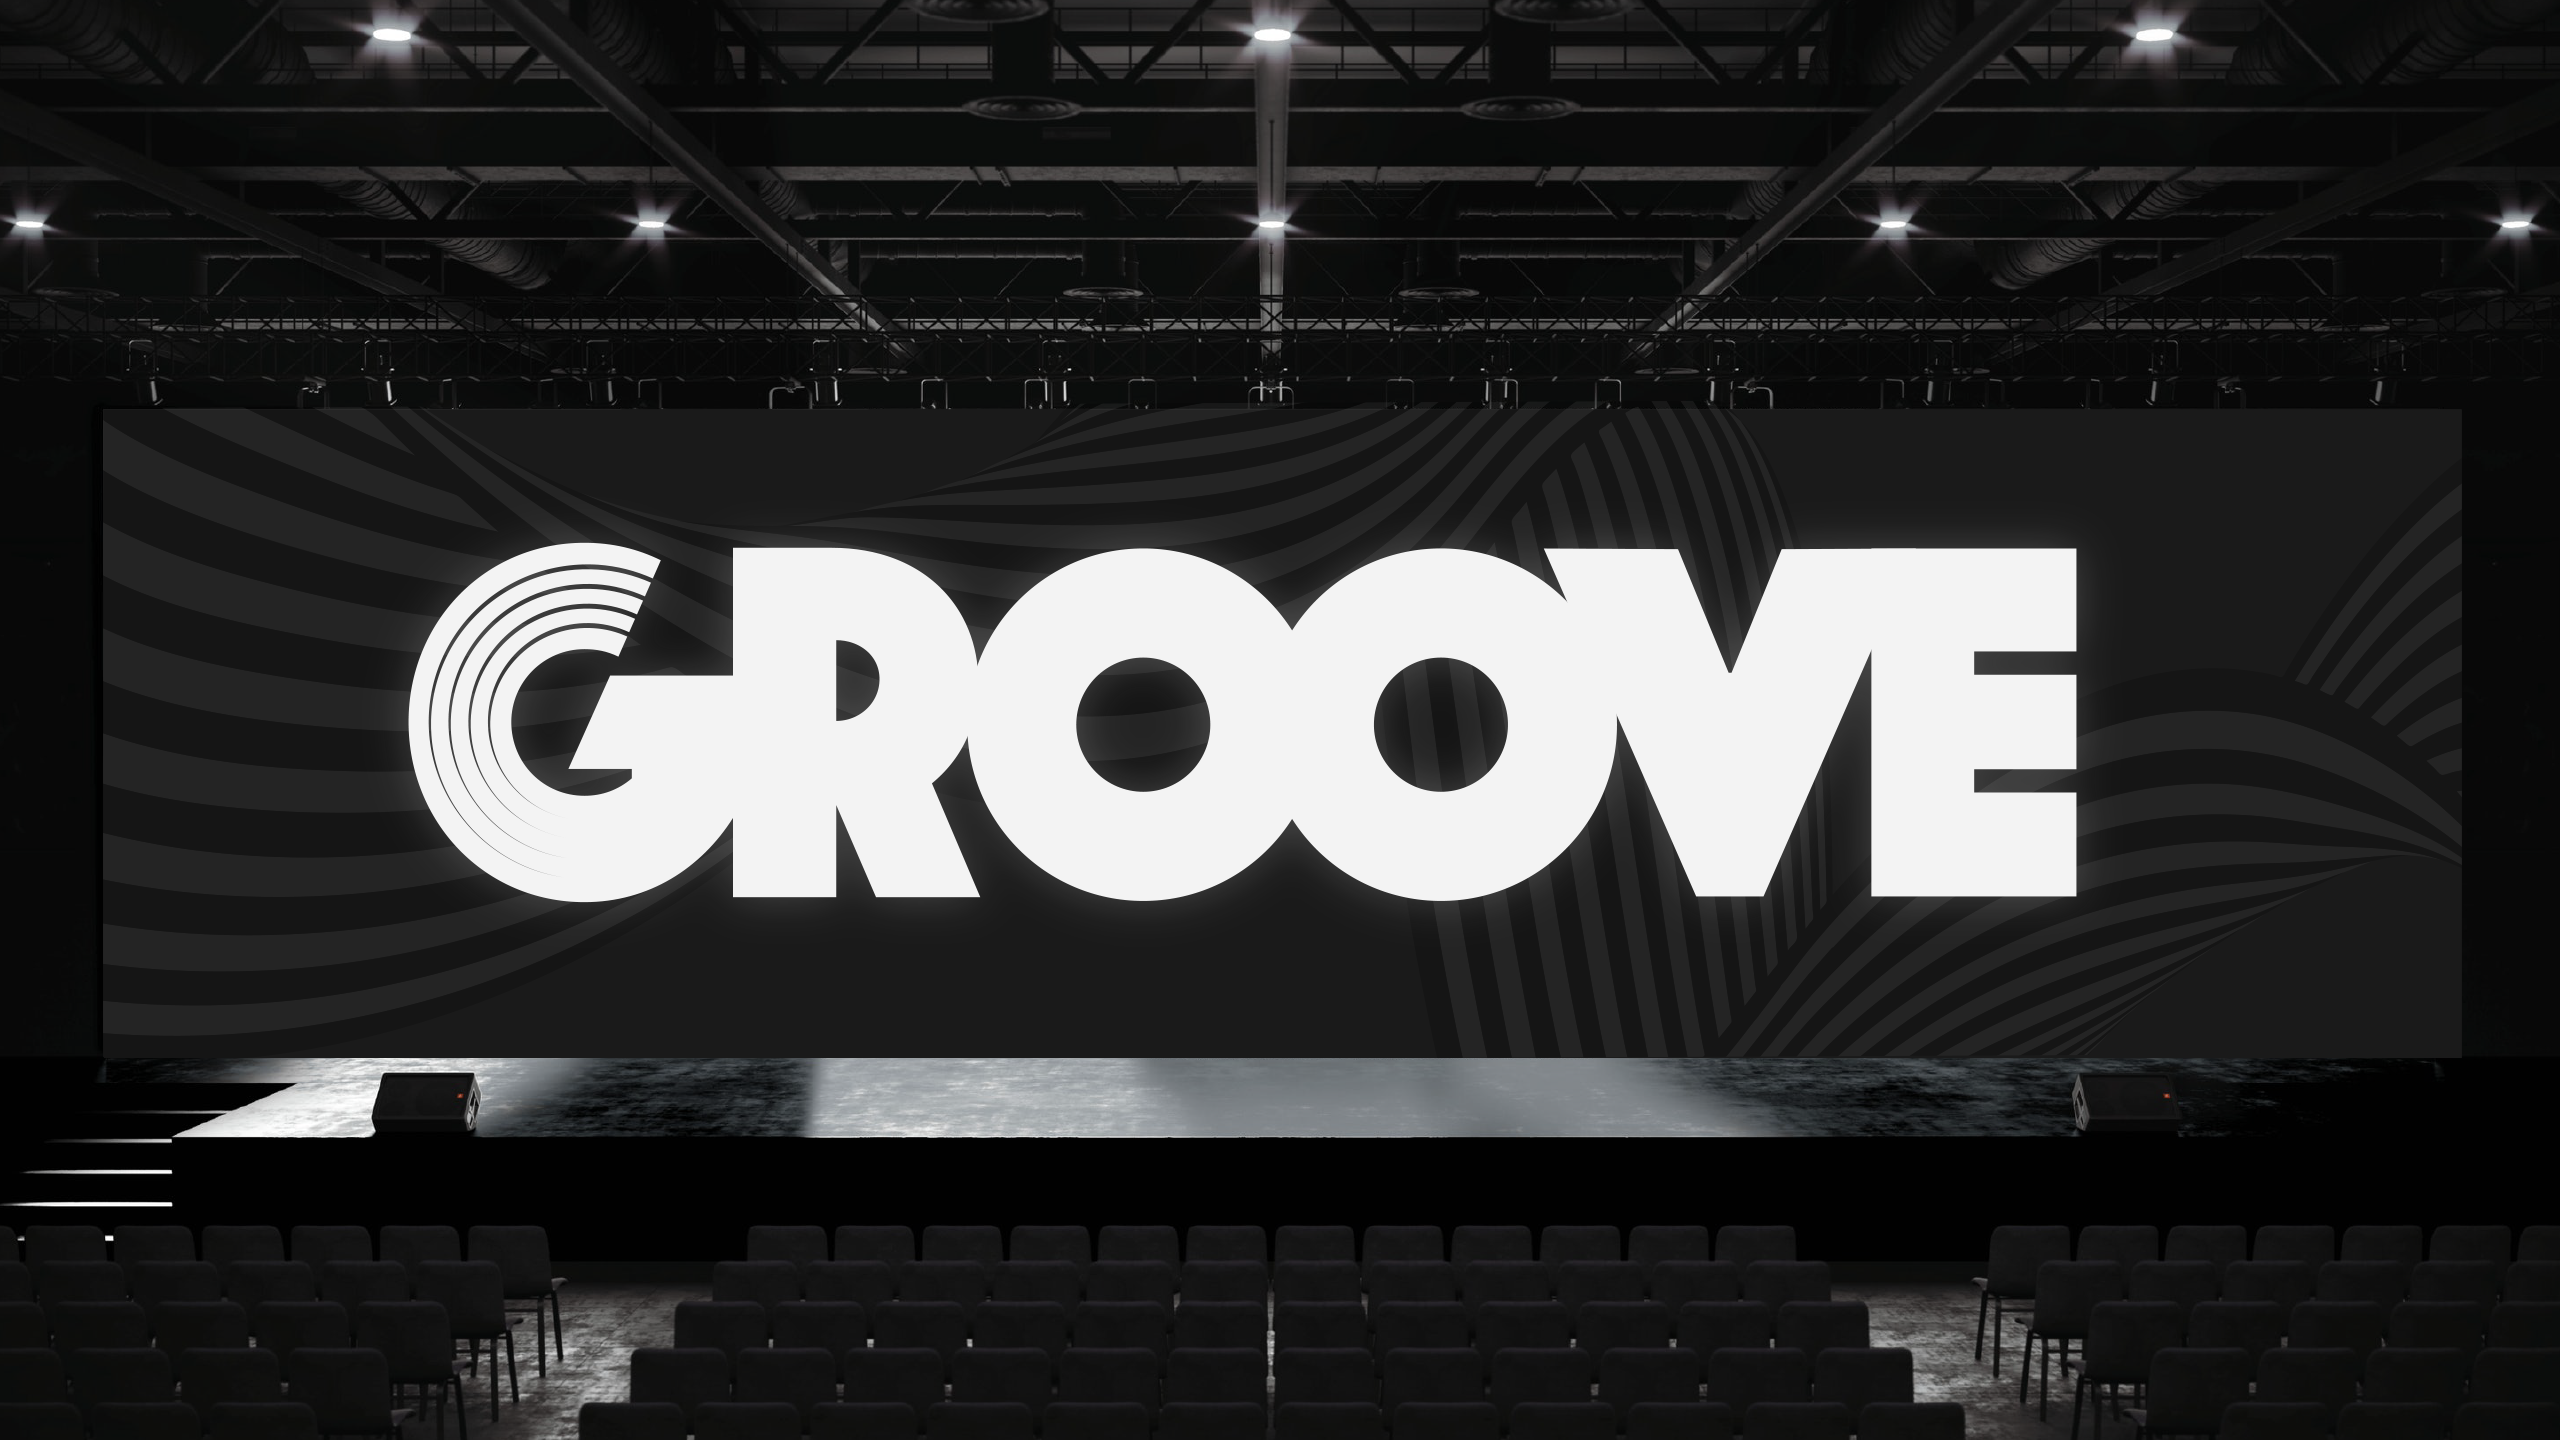 Groove Capital